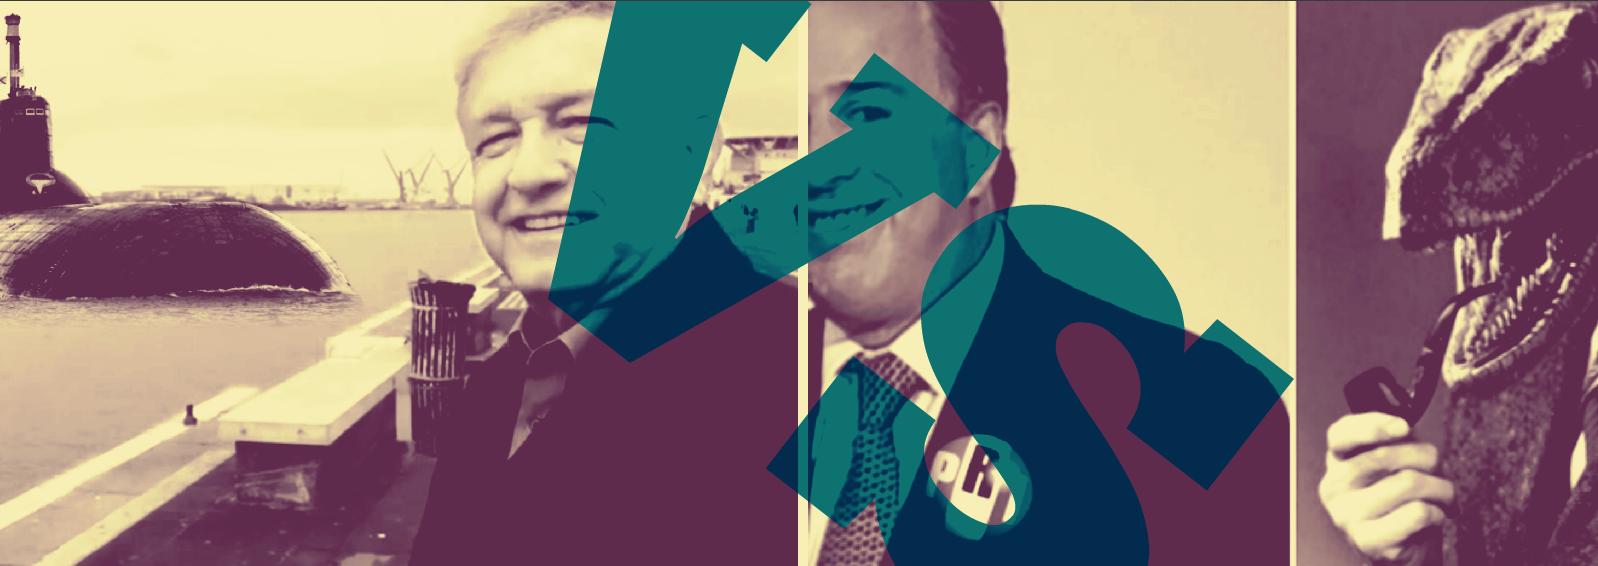 Meade vs. López Obrador | Semana 7 | Del 16 al 22 de enero del 2018